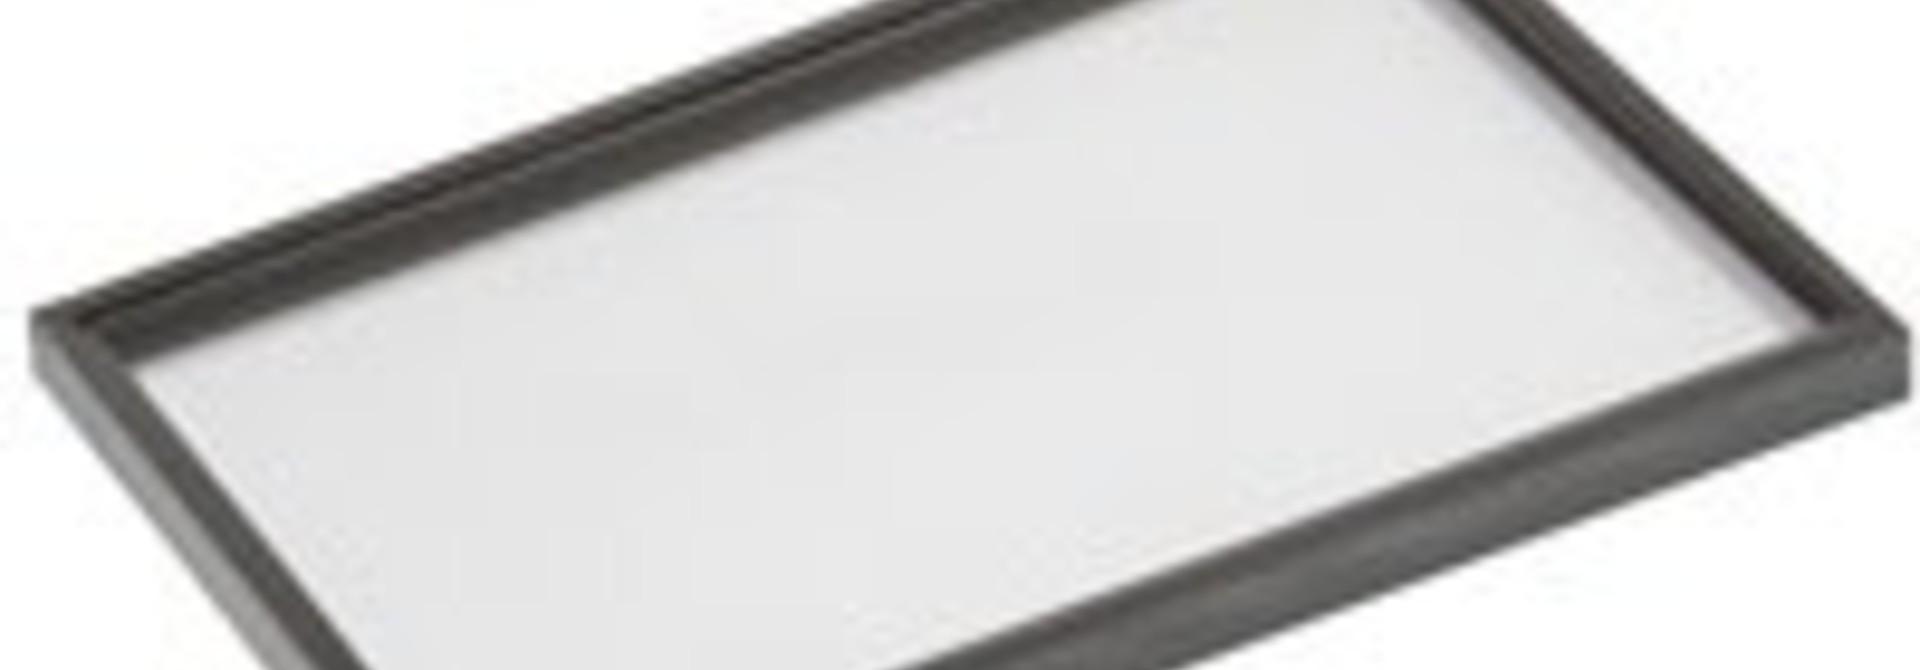 "Exo Terra Screen Covers - 35 x 60 cm (13.7"" x 23.6"")"